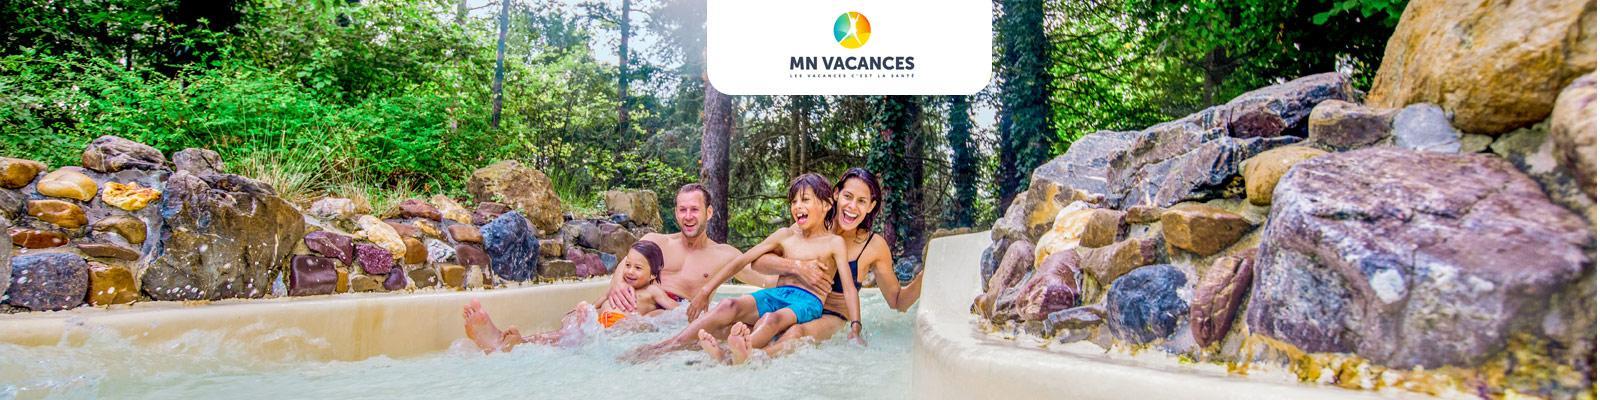 MN Vacances